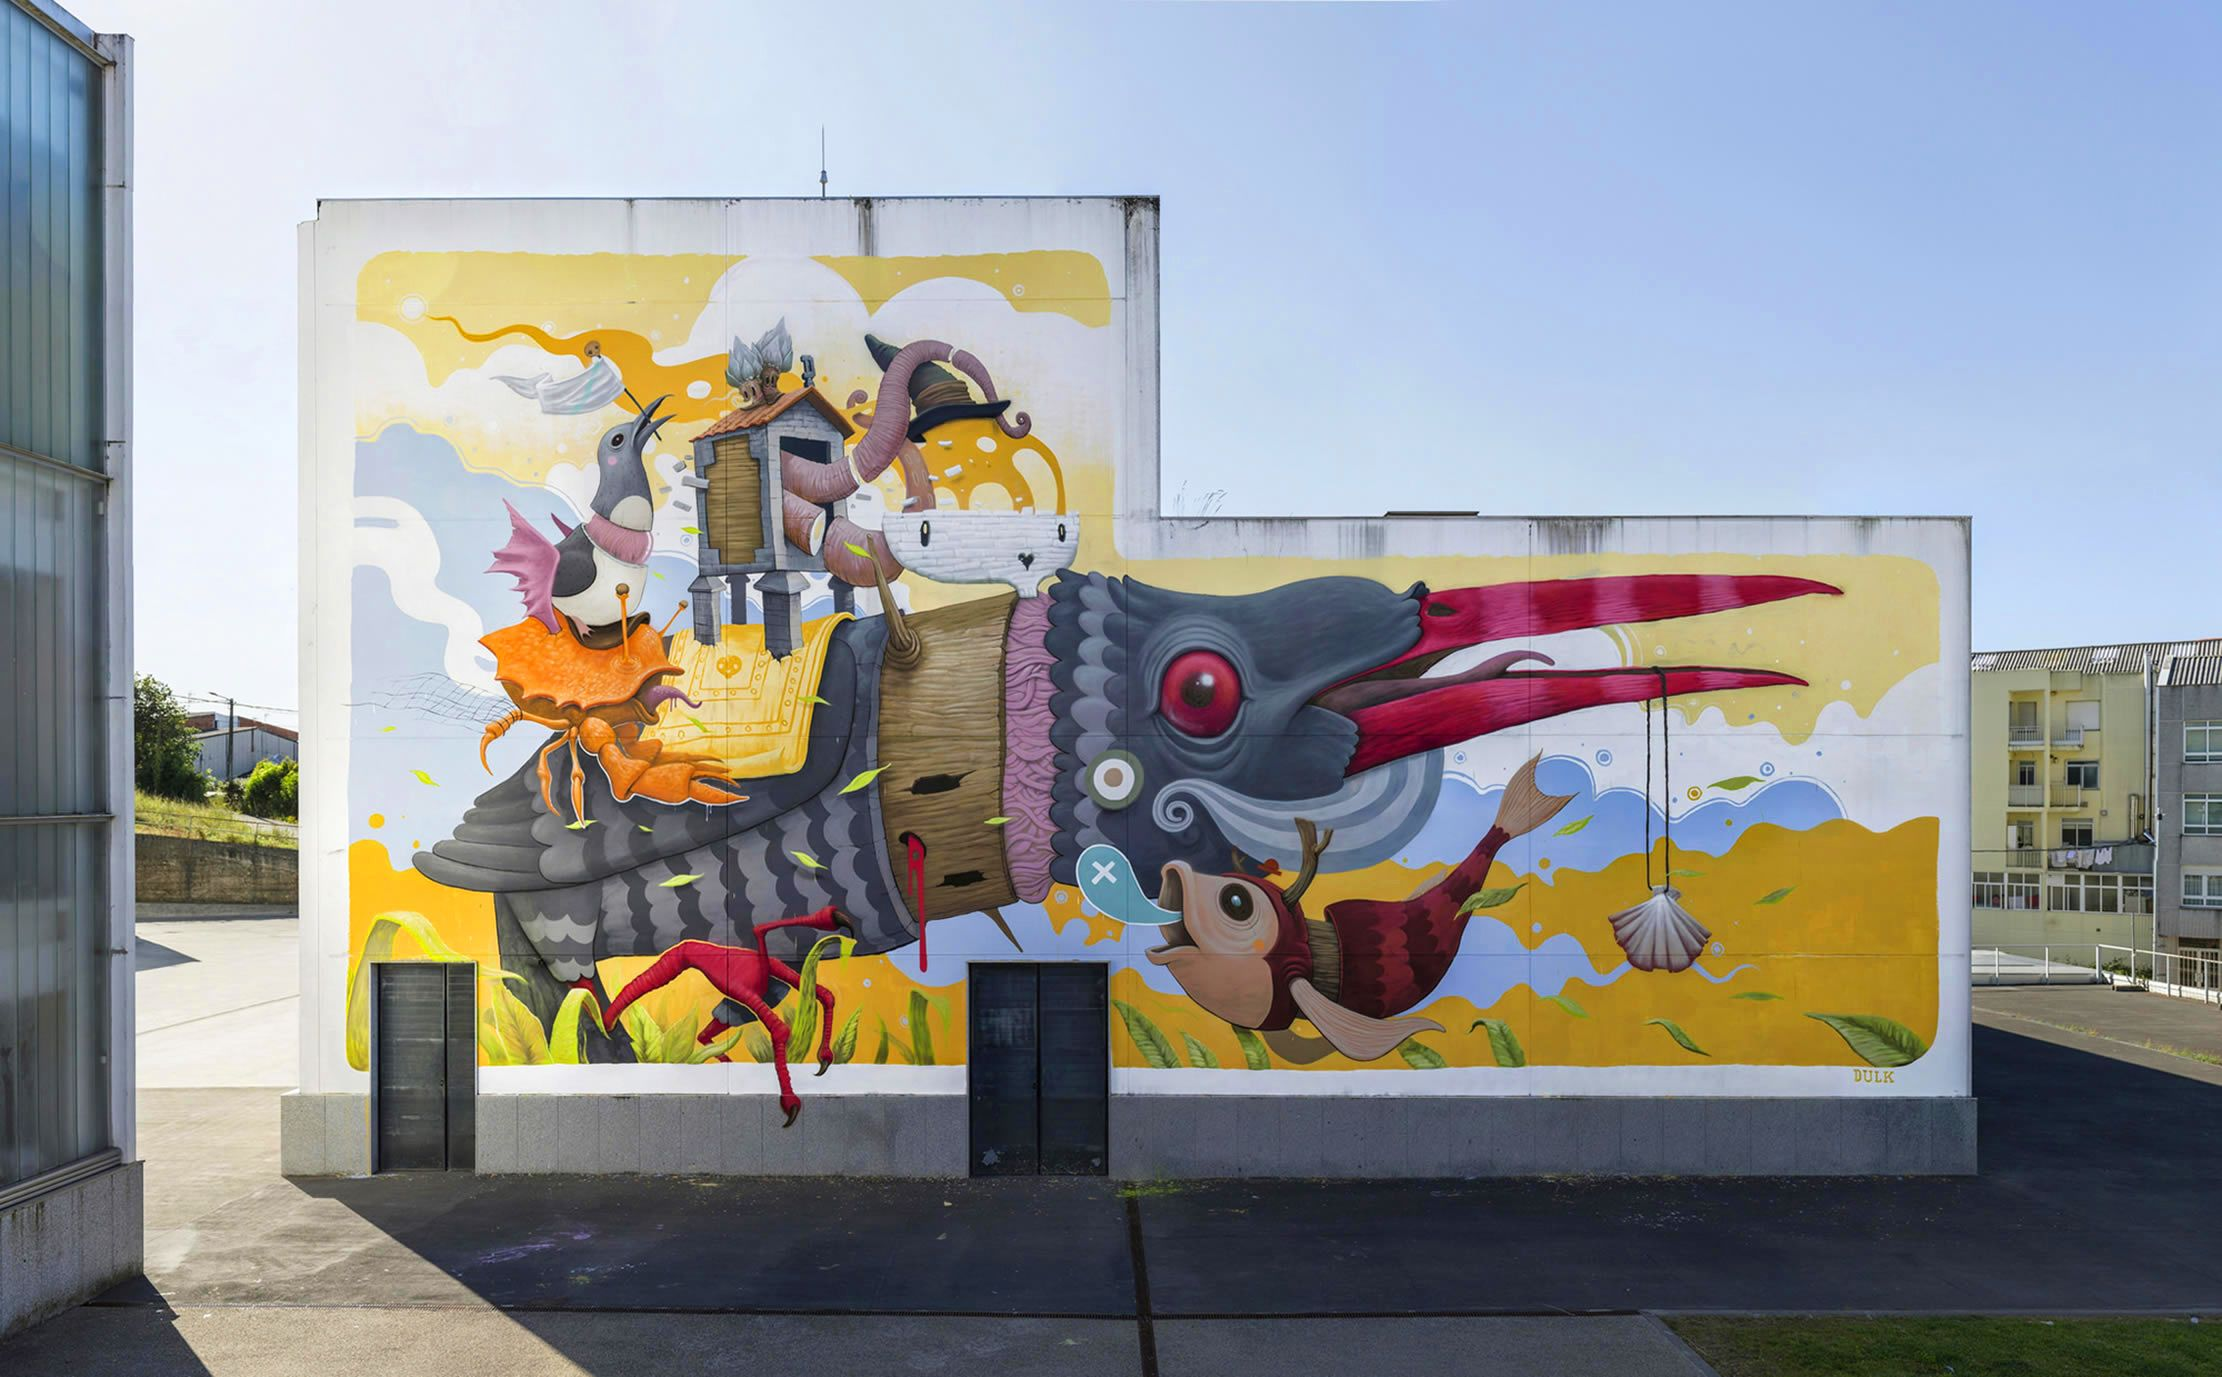 mural rexenera fest auditorio carballo graffiti street art arte urbano rural pueblo galicia